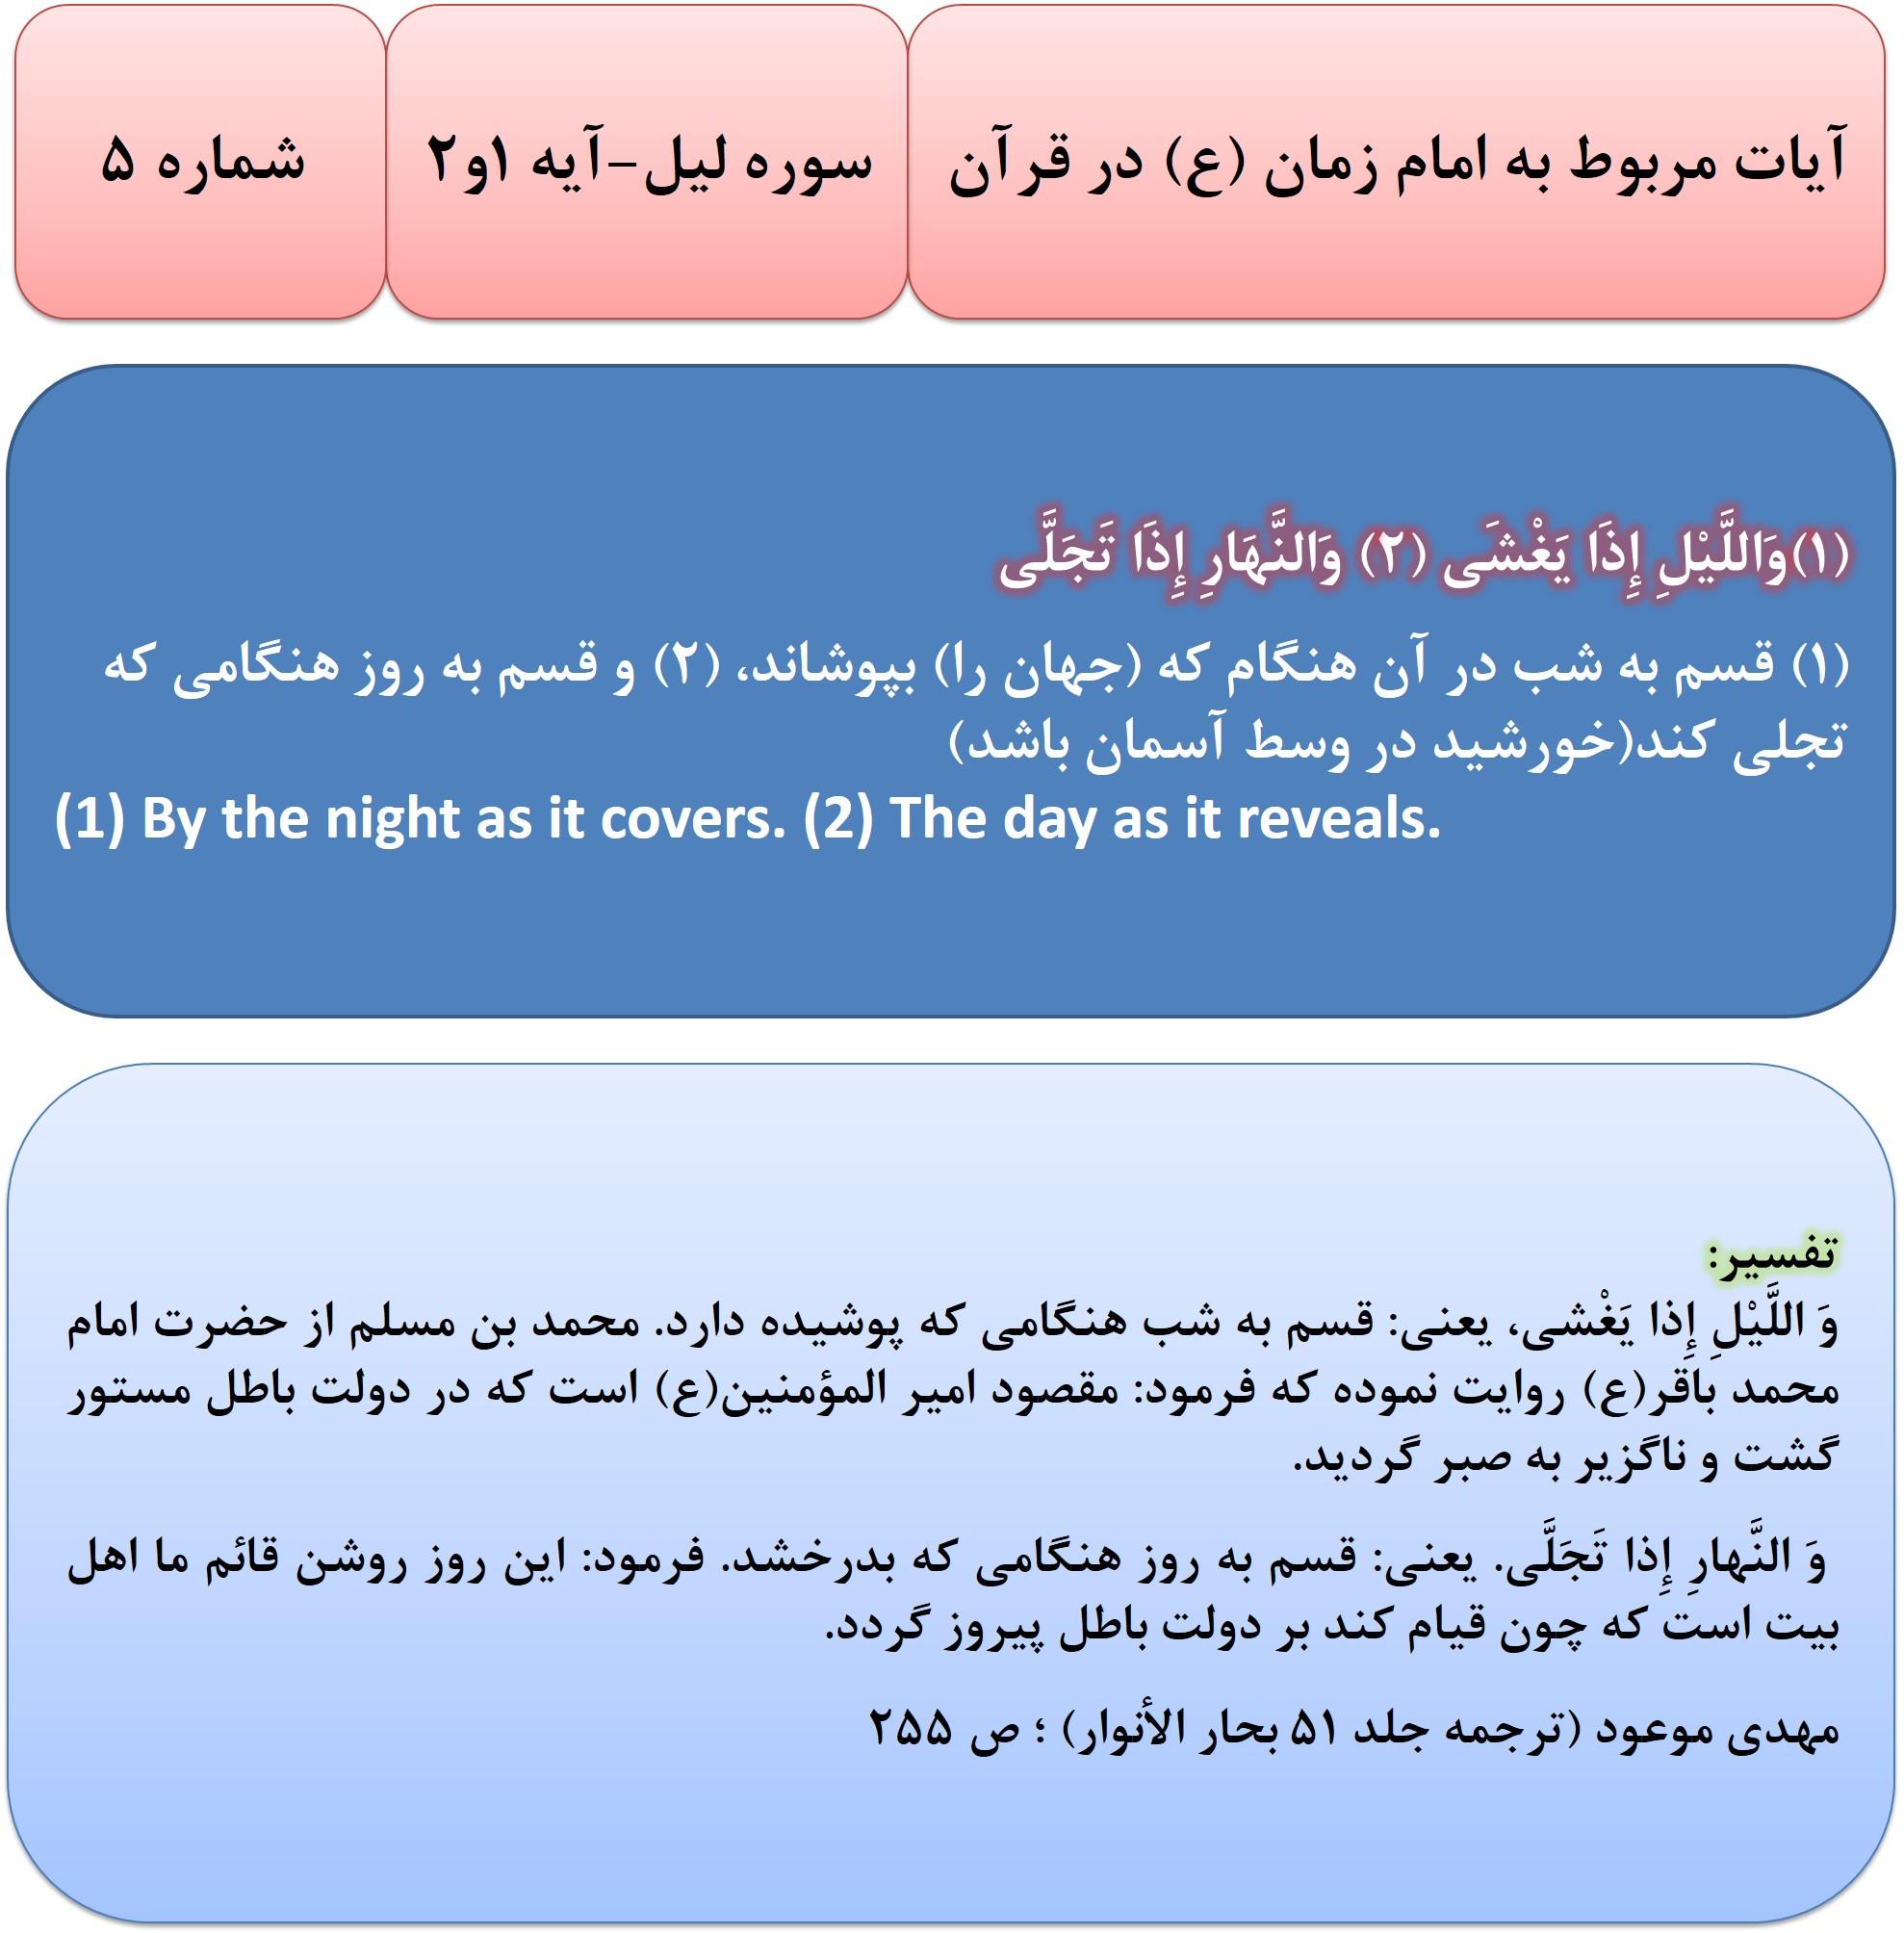 http://bayanbox.ir/view/7796633092506734978/Mahdi-In-Quran-5.jpg